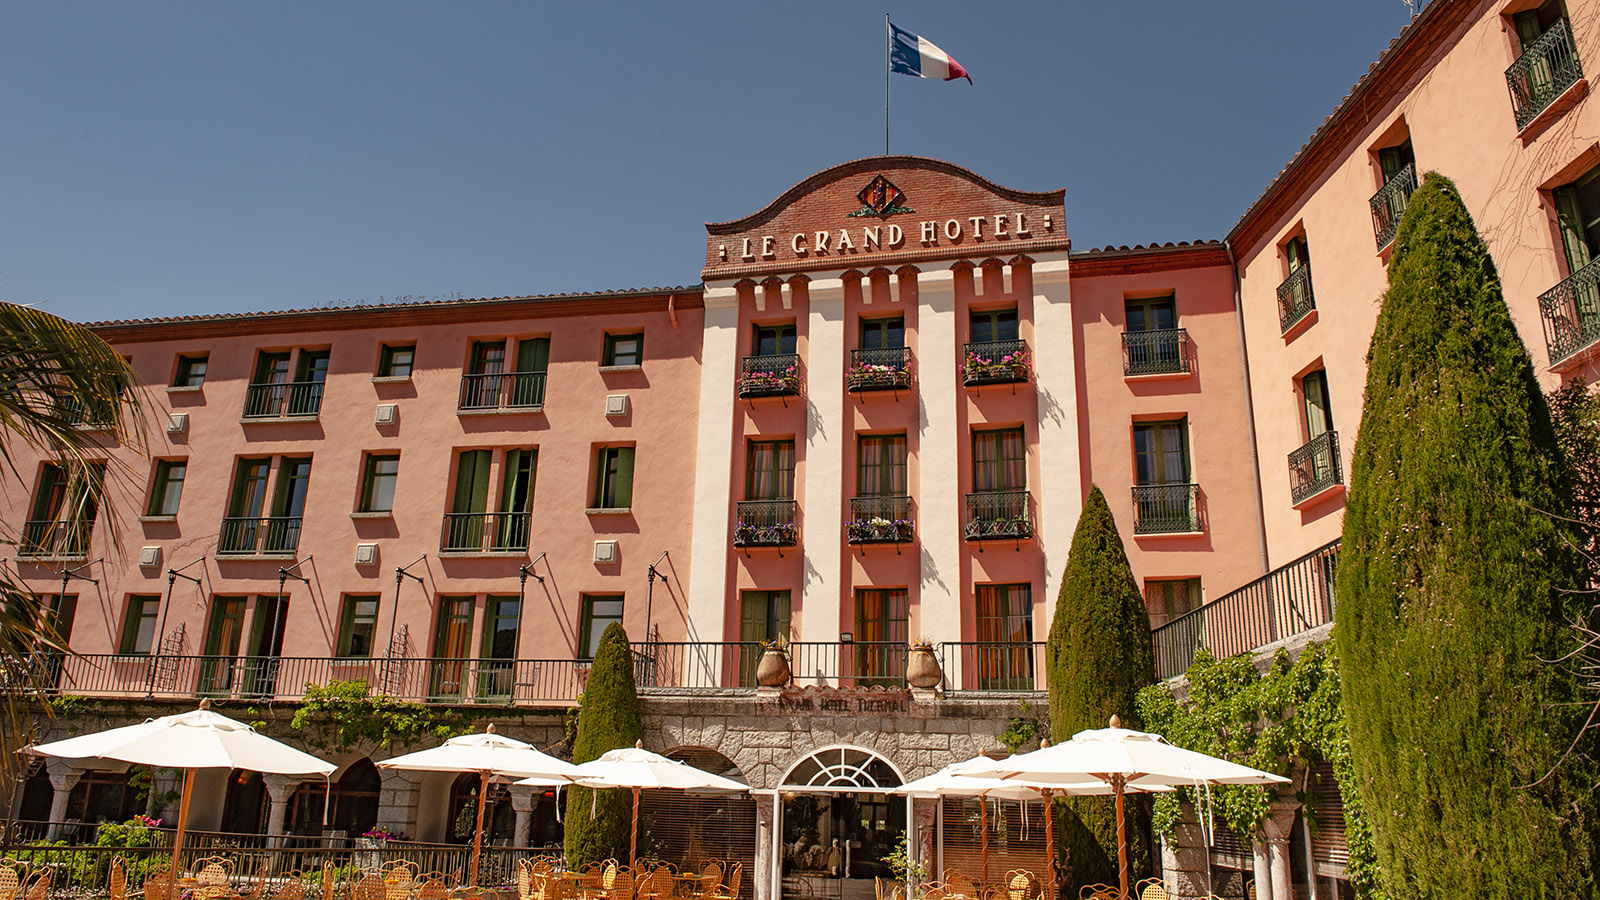 Das Grand Hôtel von Molitg-les-Bains. Foto: Hilke Maunder